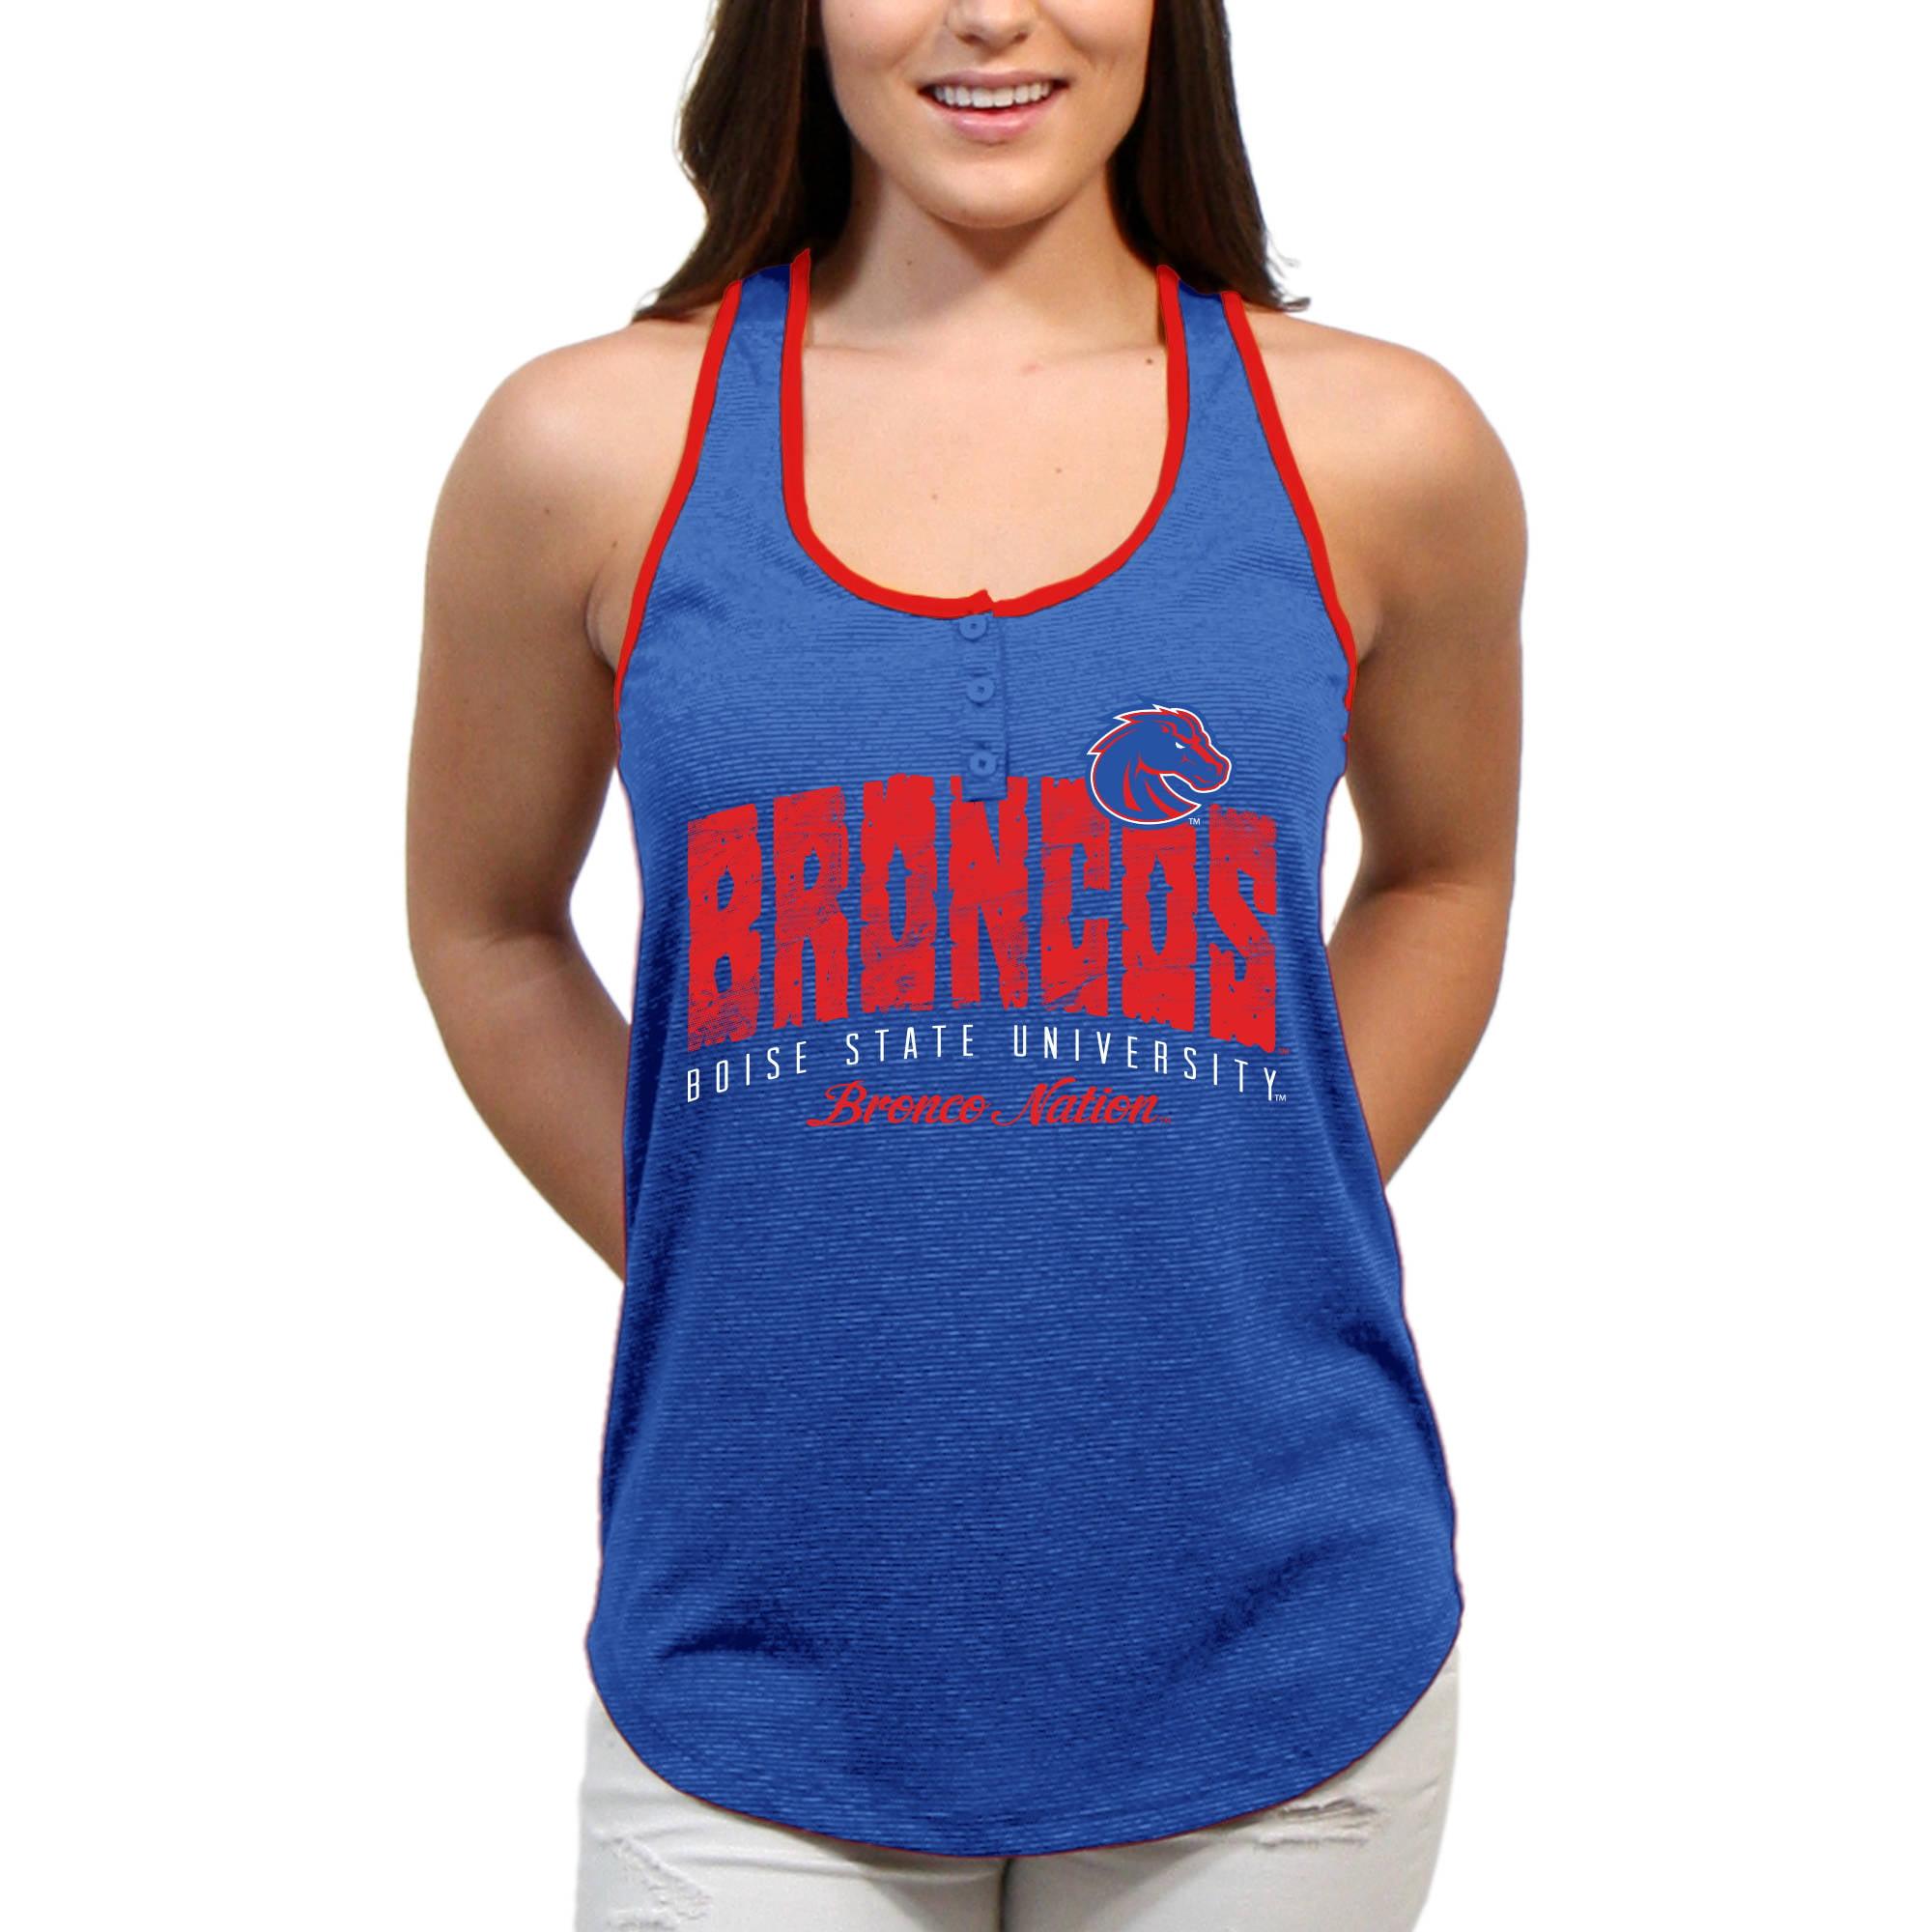 Boise State Broncos Choppy Arch Women'S/Juniors Team Tank Top